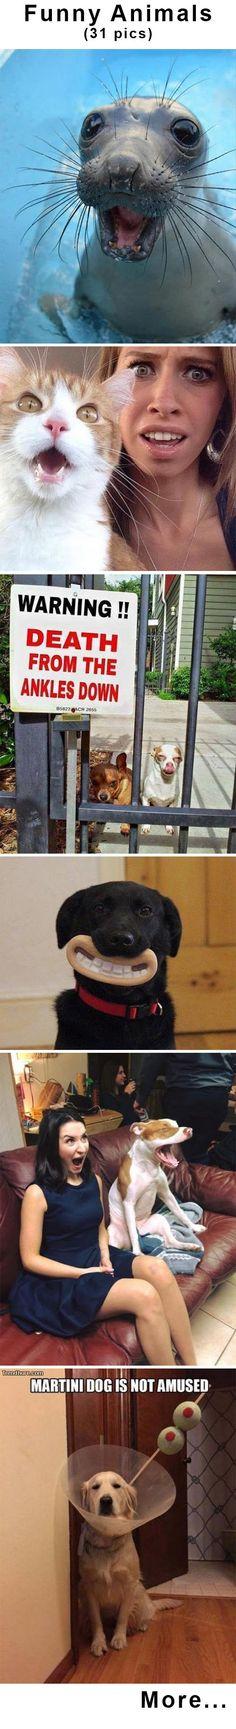 Funny Animals (31pics) #dailygags #funnyanimals